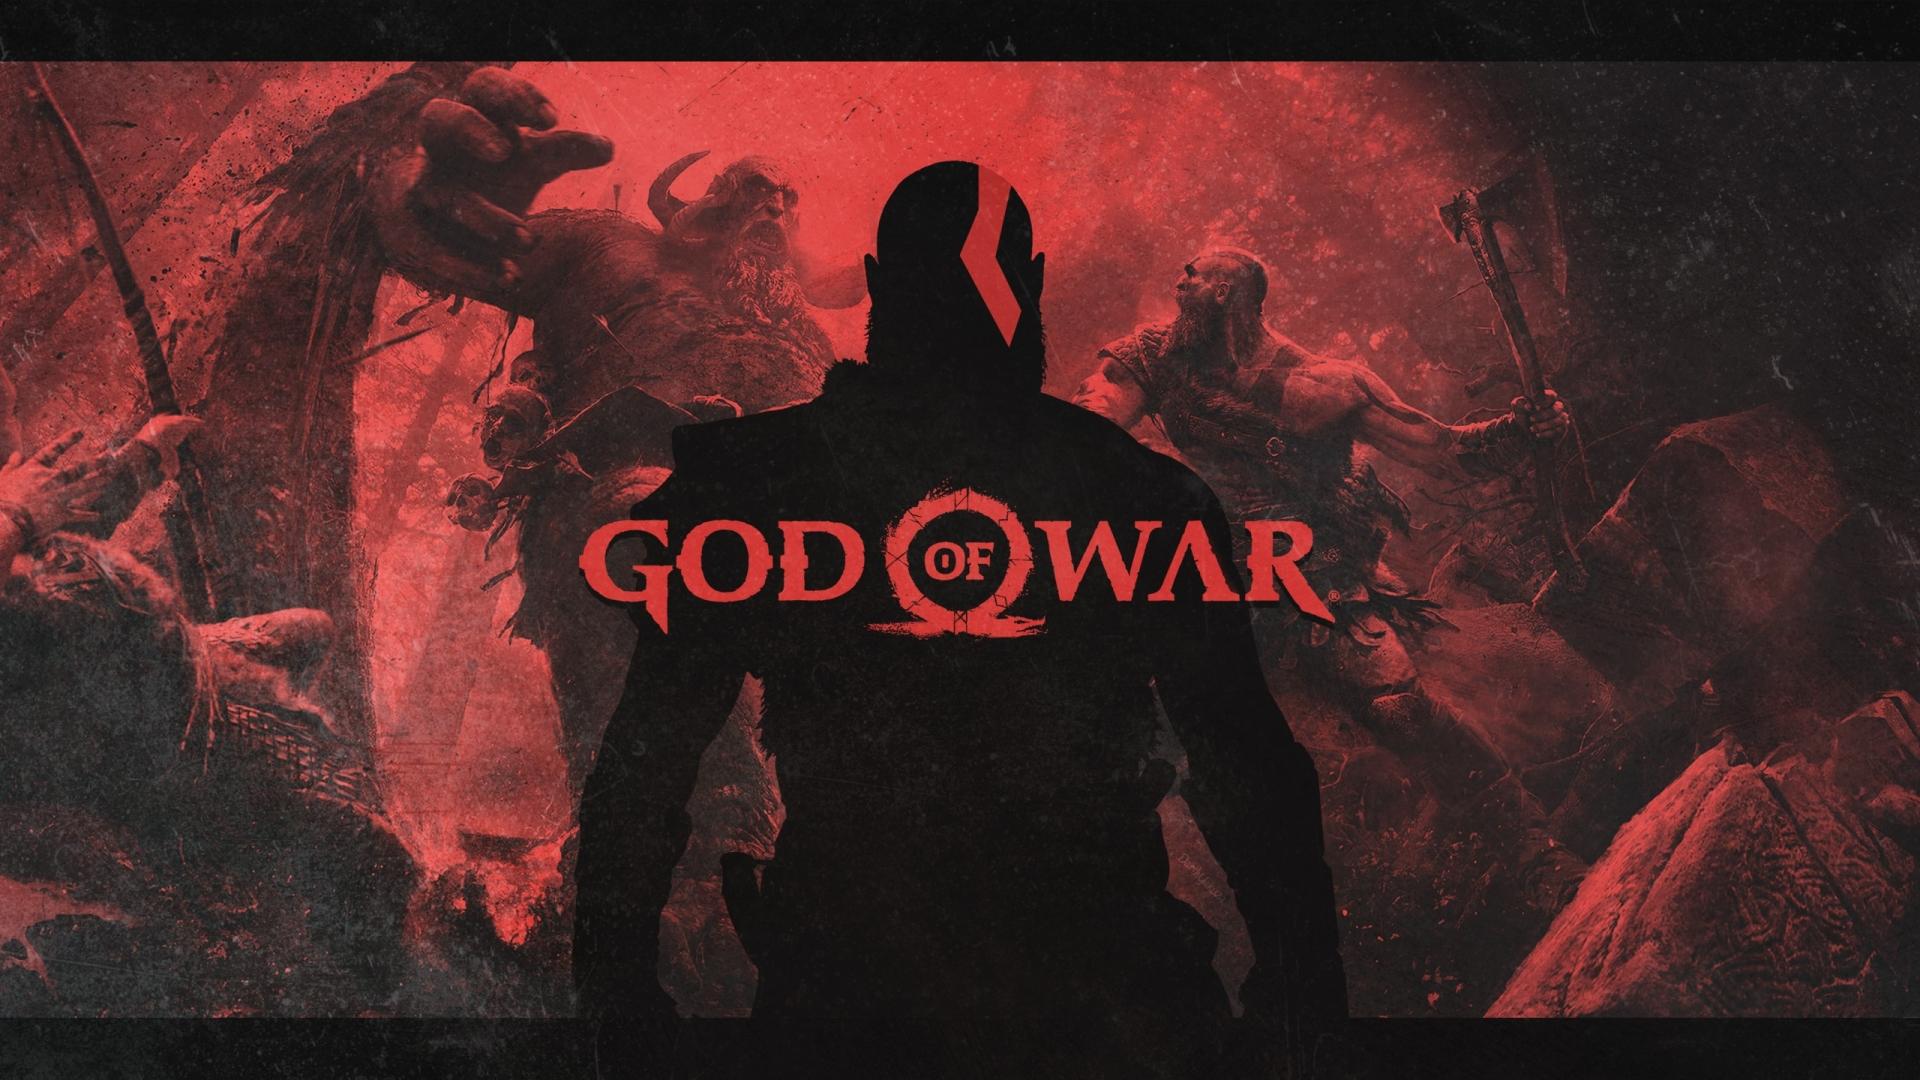 1920x1080 God Of War 4 Video Game Poster 1080p Laptop Full